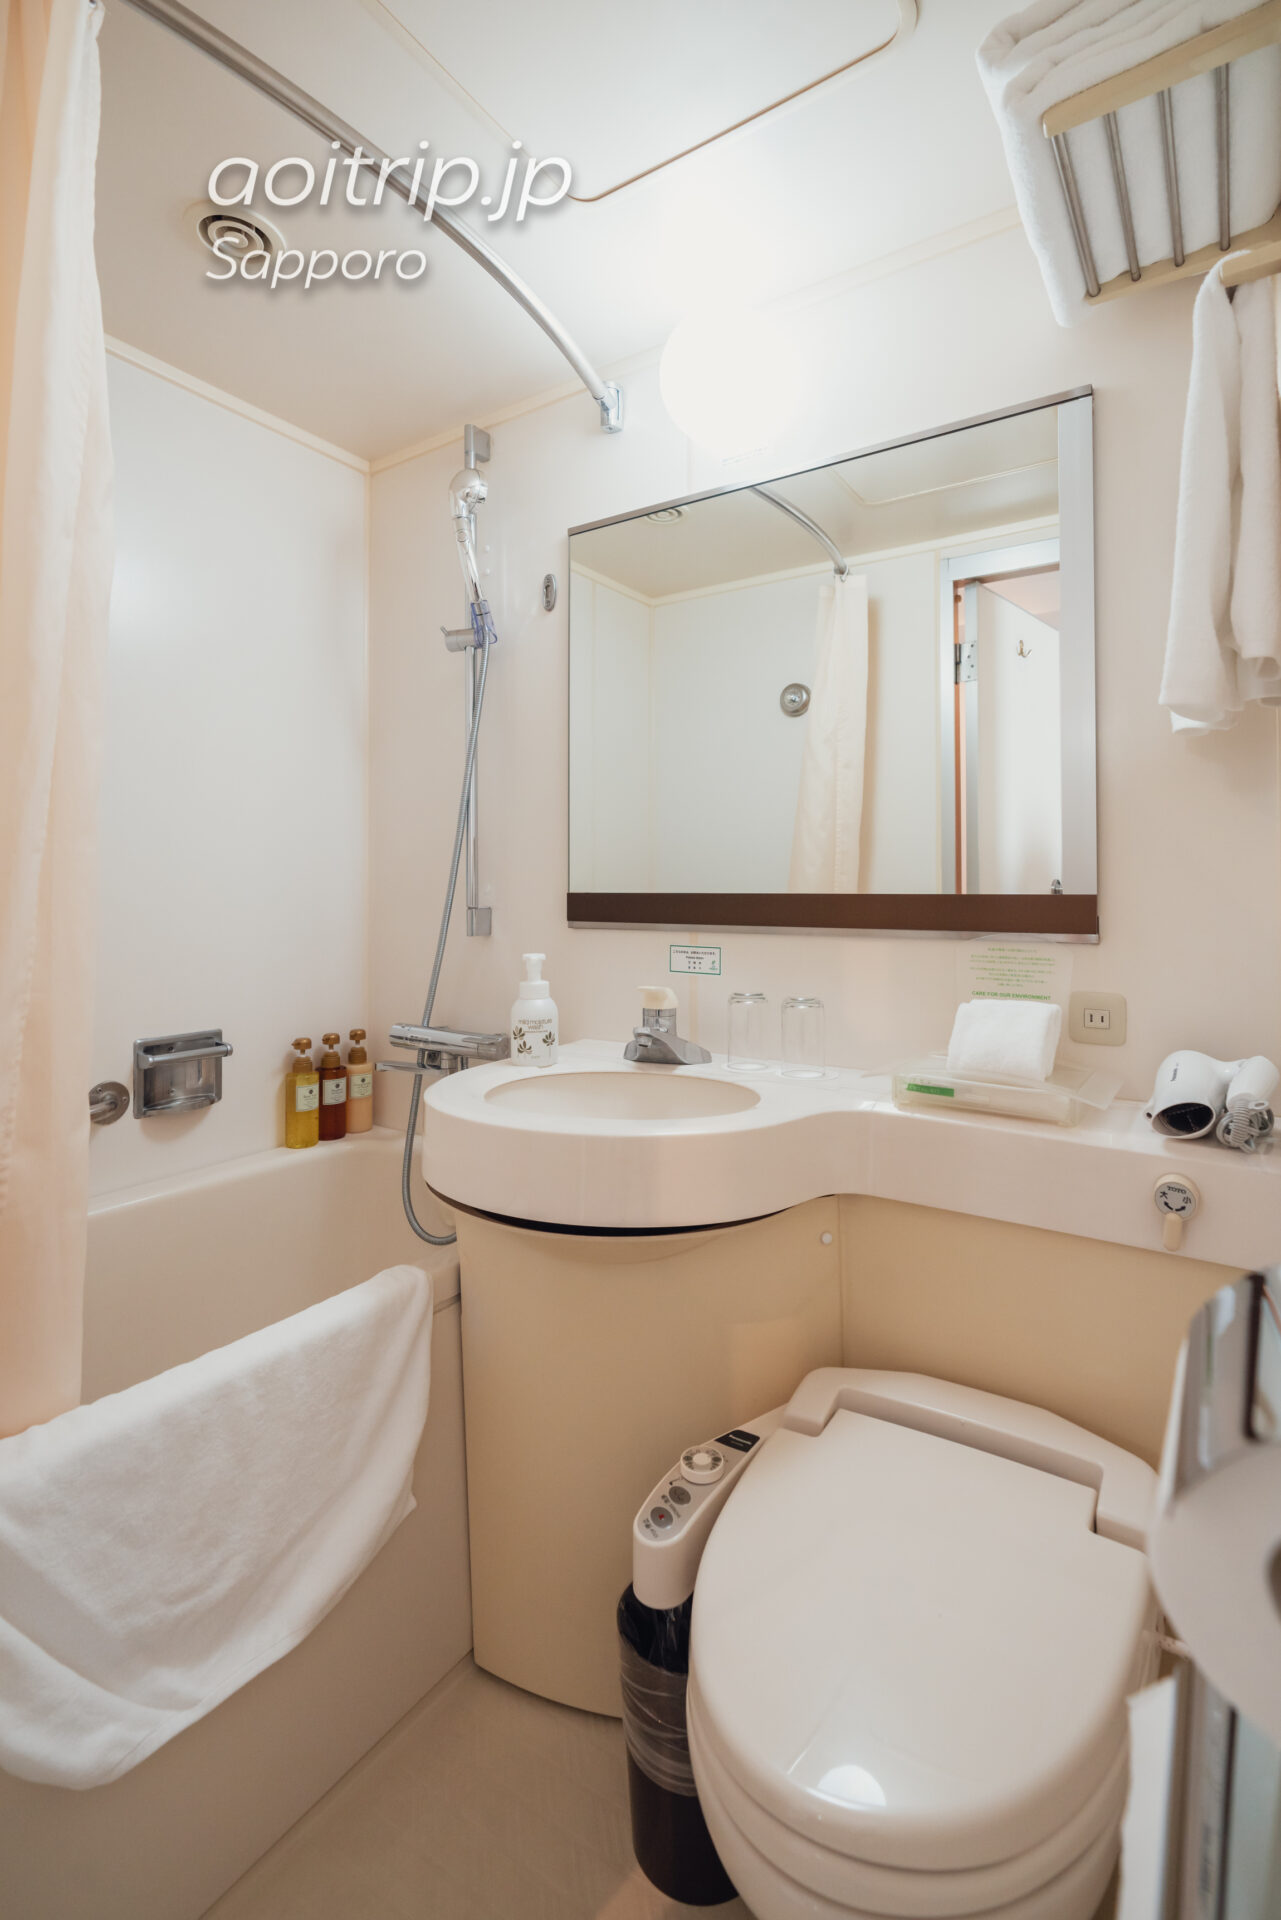 ANAホリデイイン札幌すすきの バスルーム